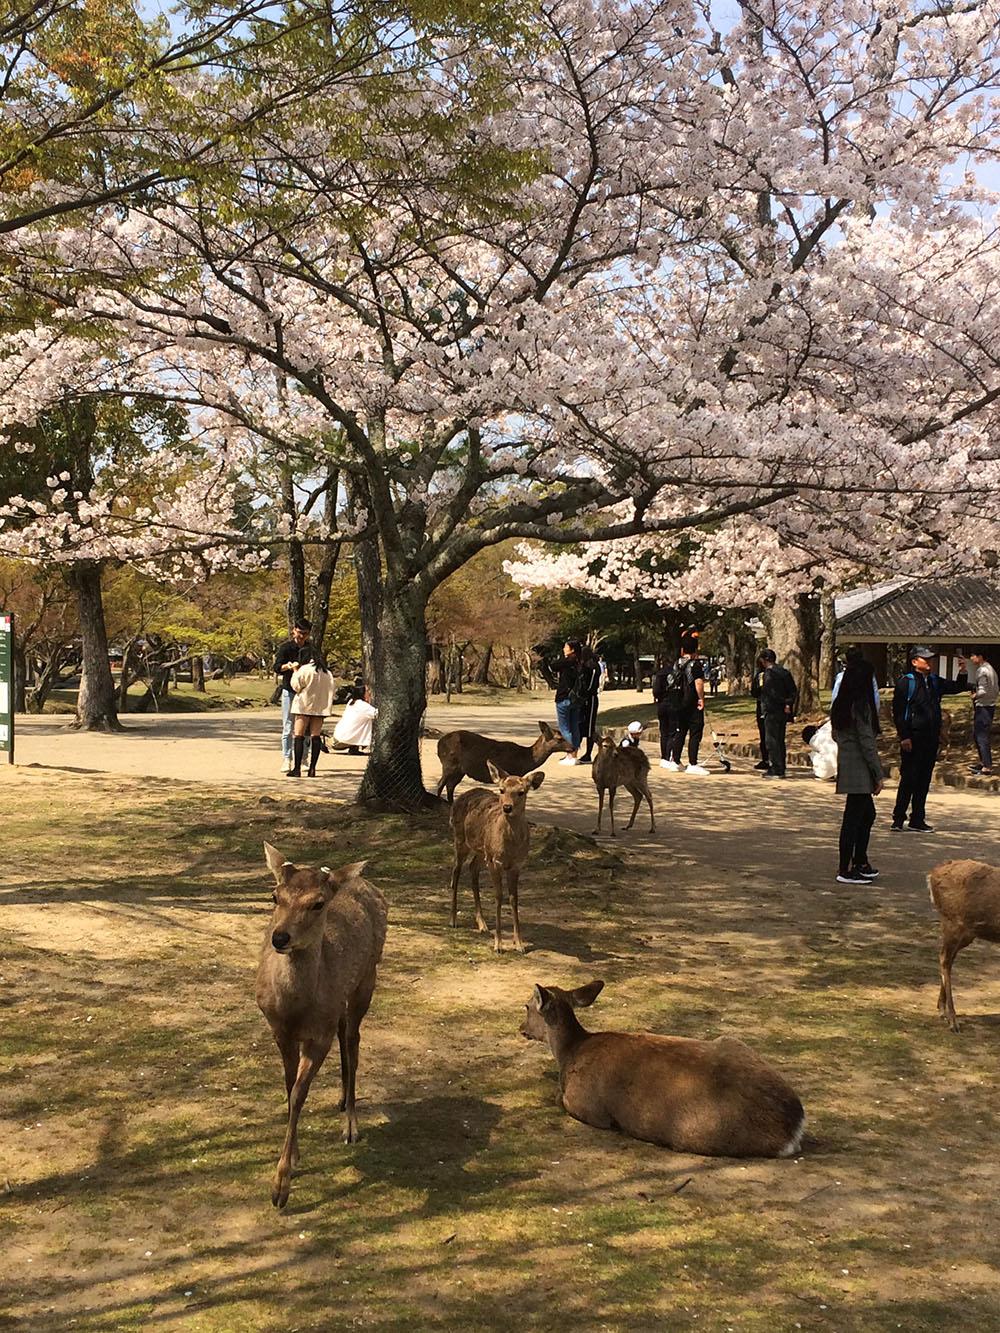 Mooi park met prachtige kersenbloesem bomen